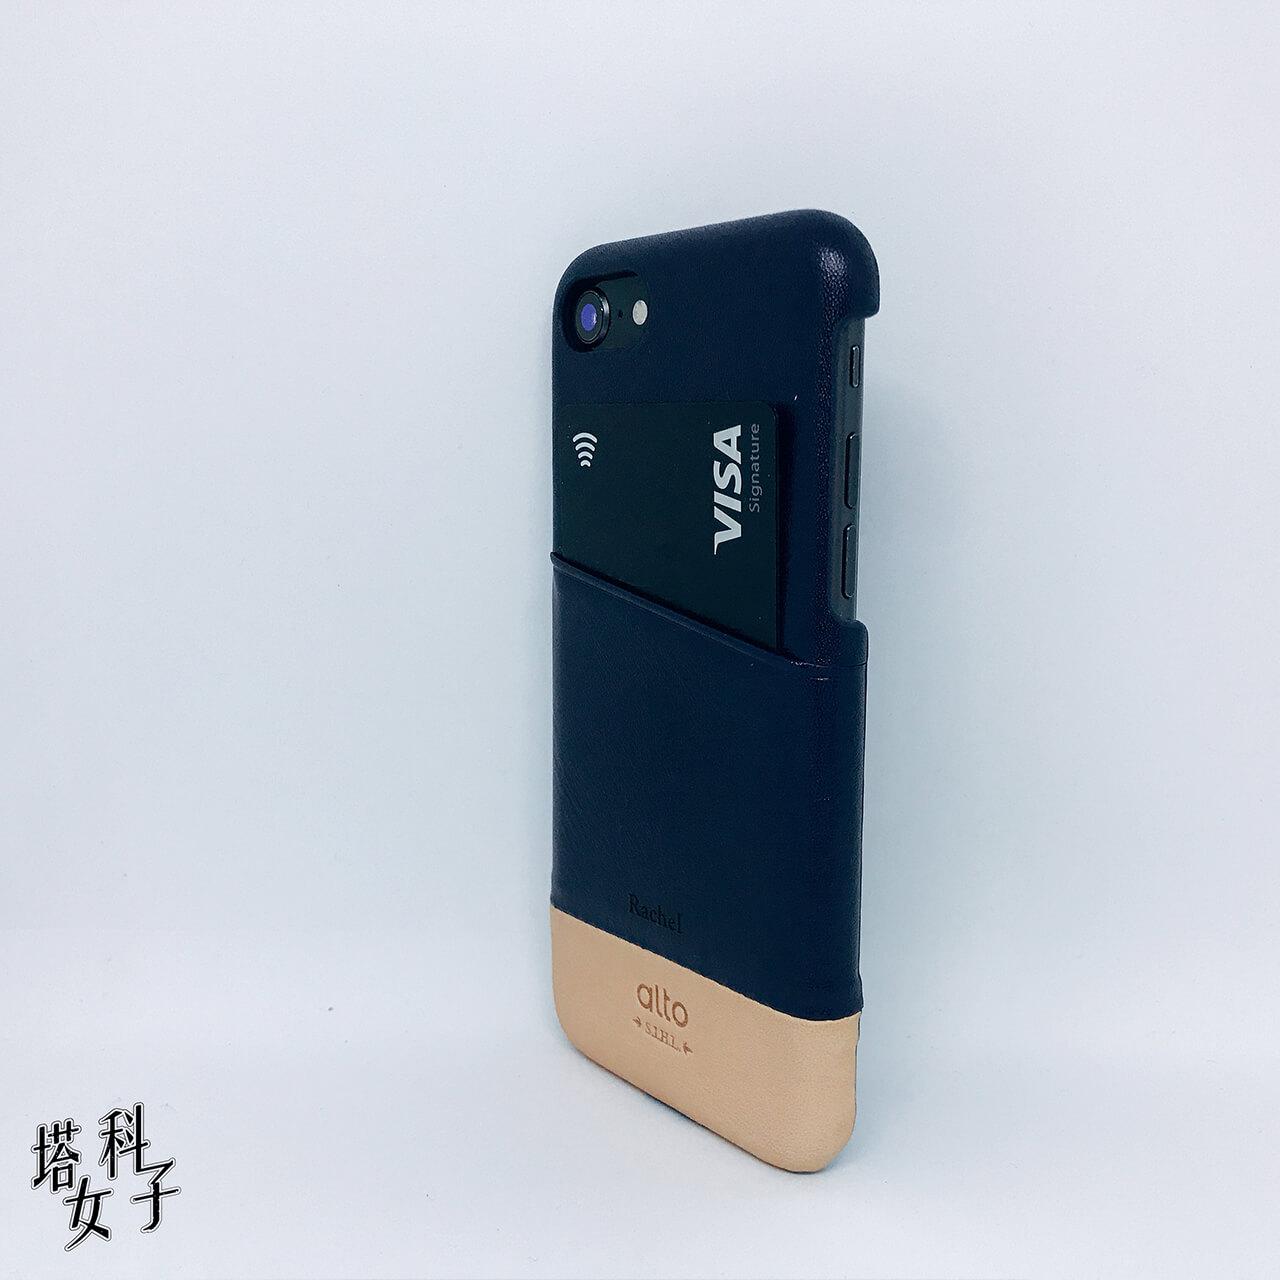 iPhone 手機殼開箱 - alto 悠遊卡